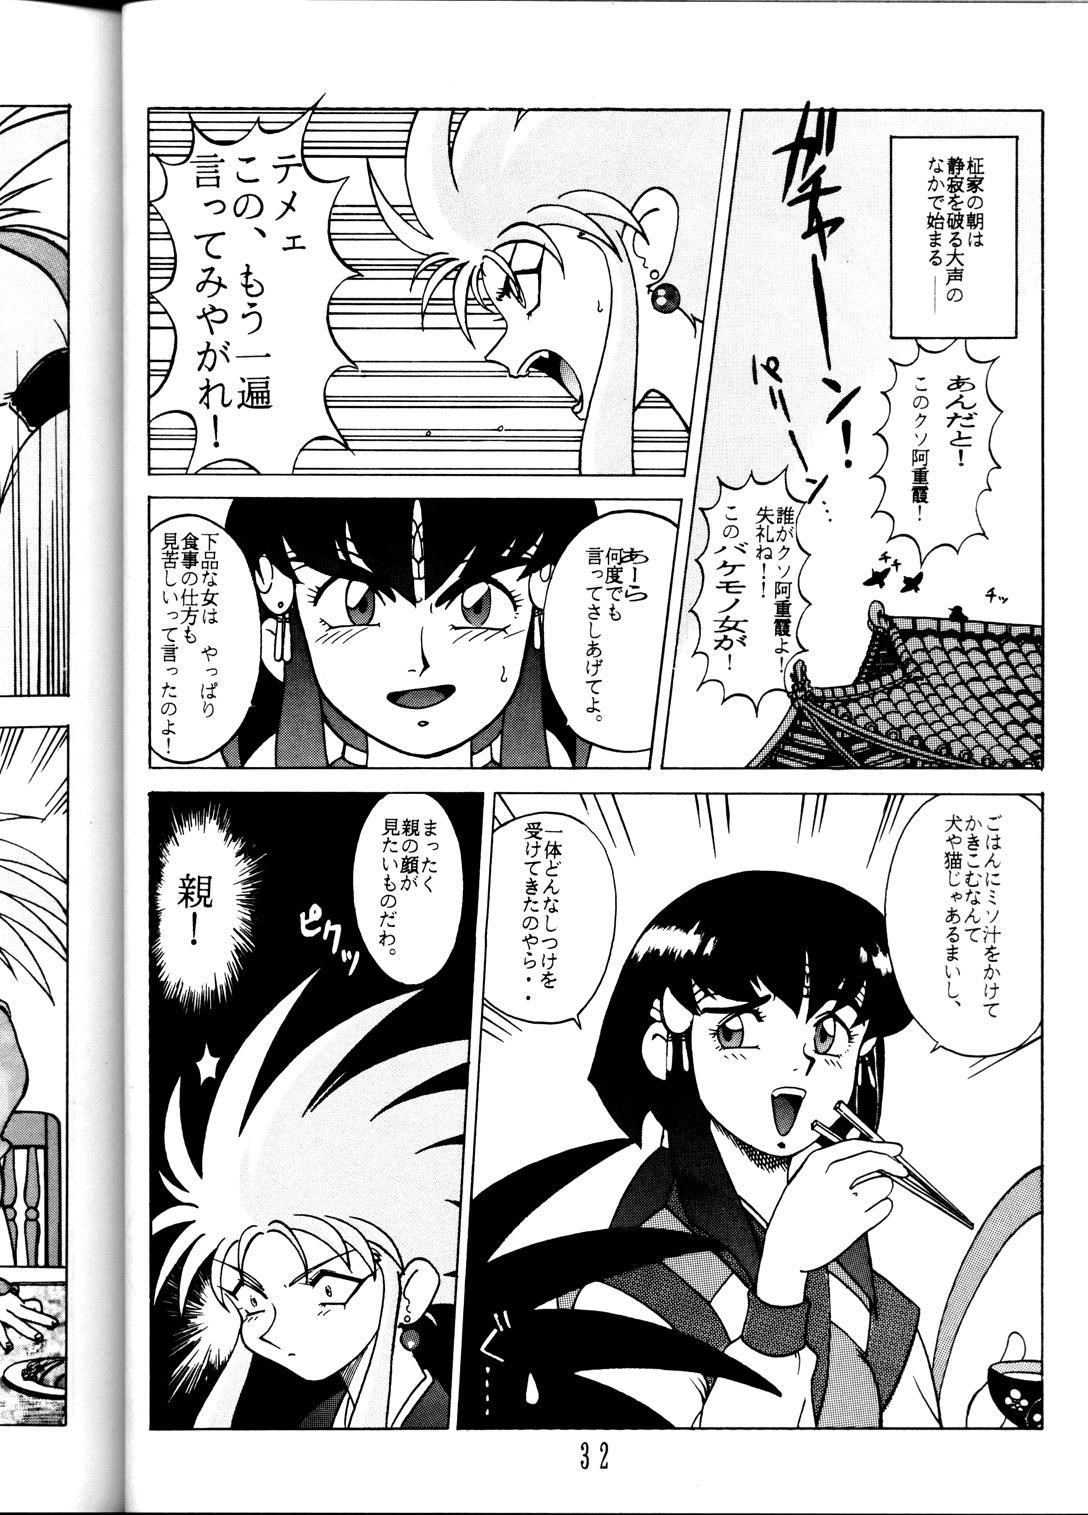 Tenchi Muyou! Sample Vol 6 30